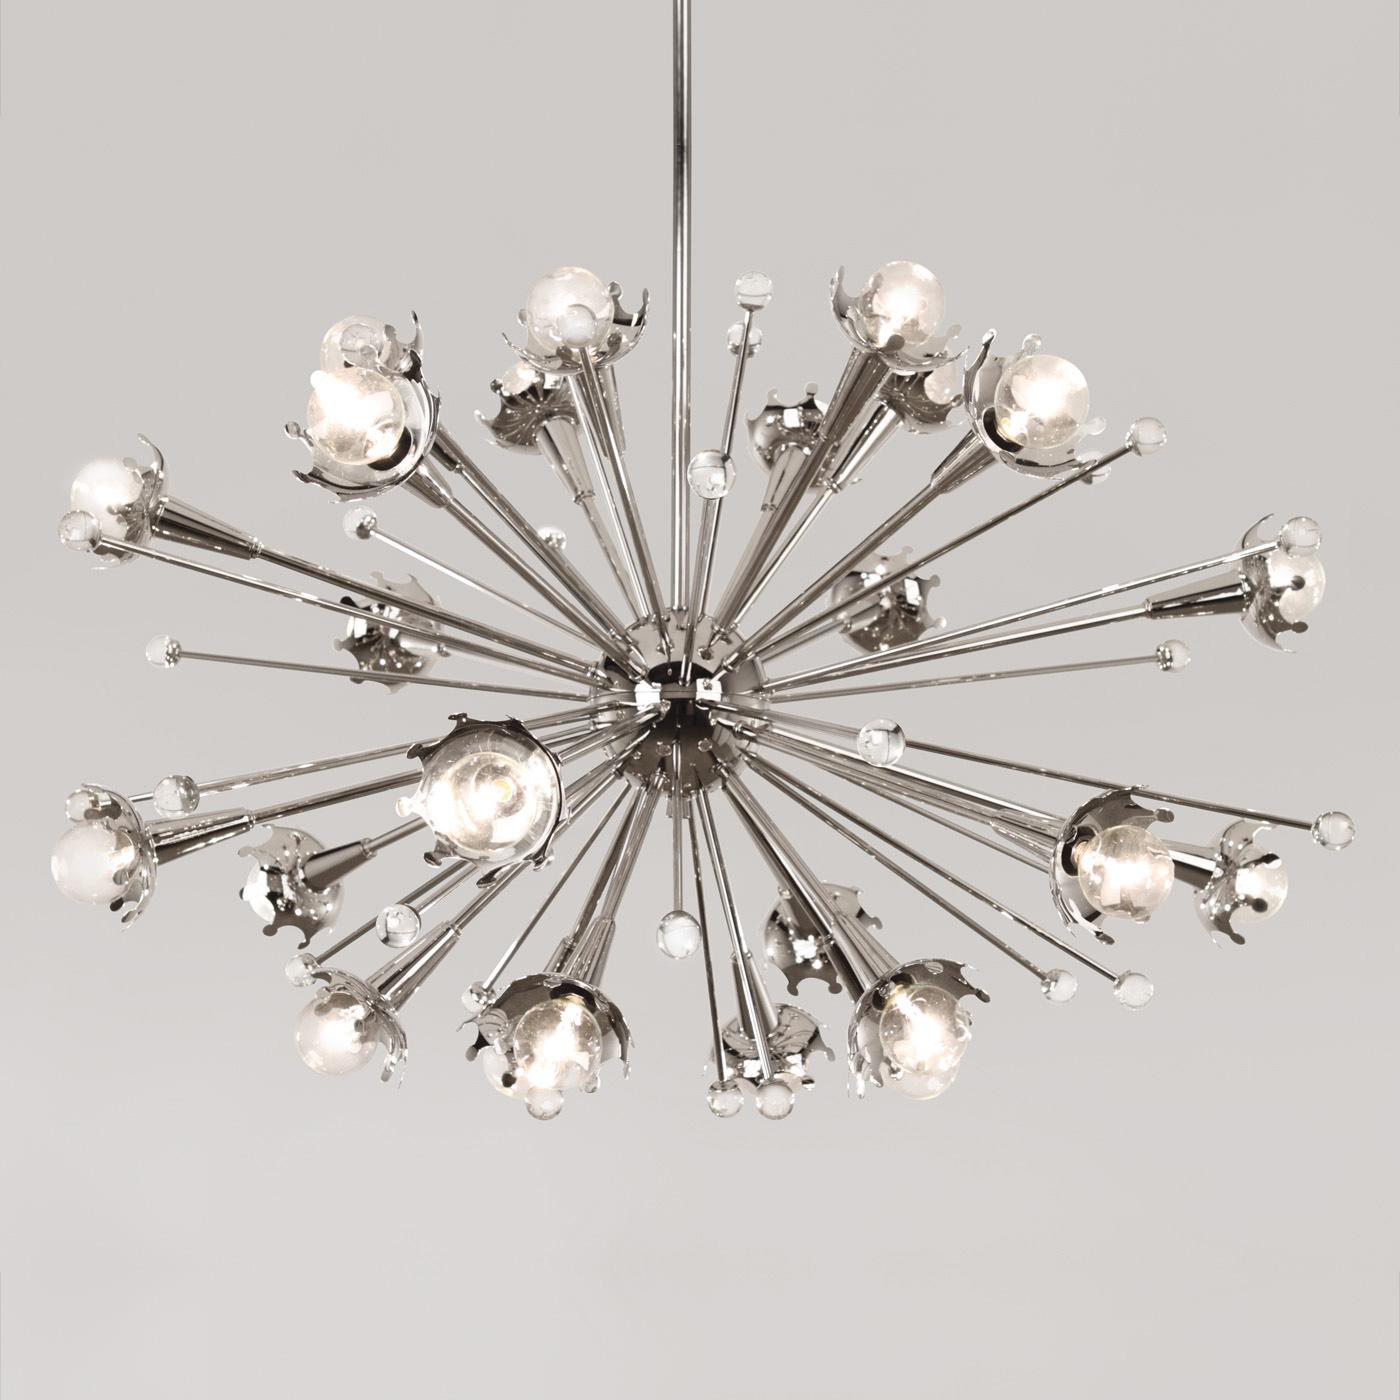 chandelier by jonathan adler  ras - sputnik chandelier by jonathan adler  ras